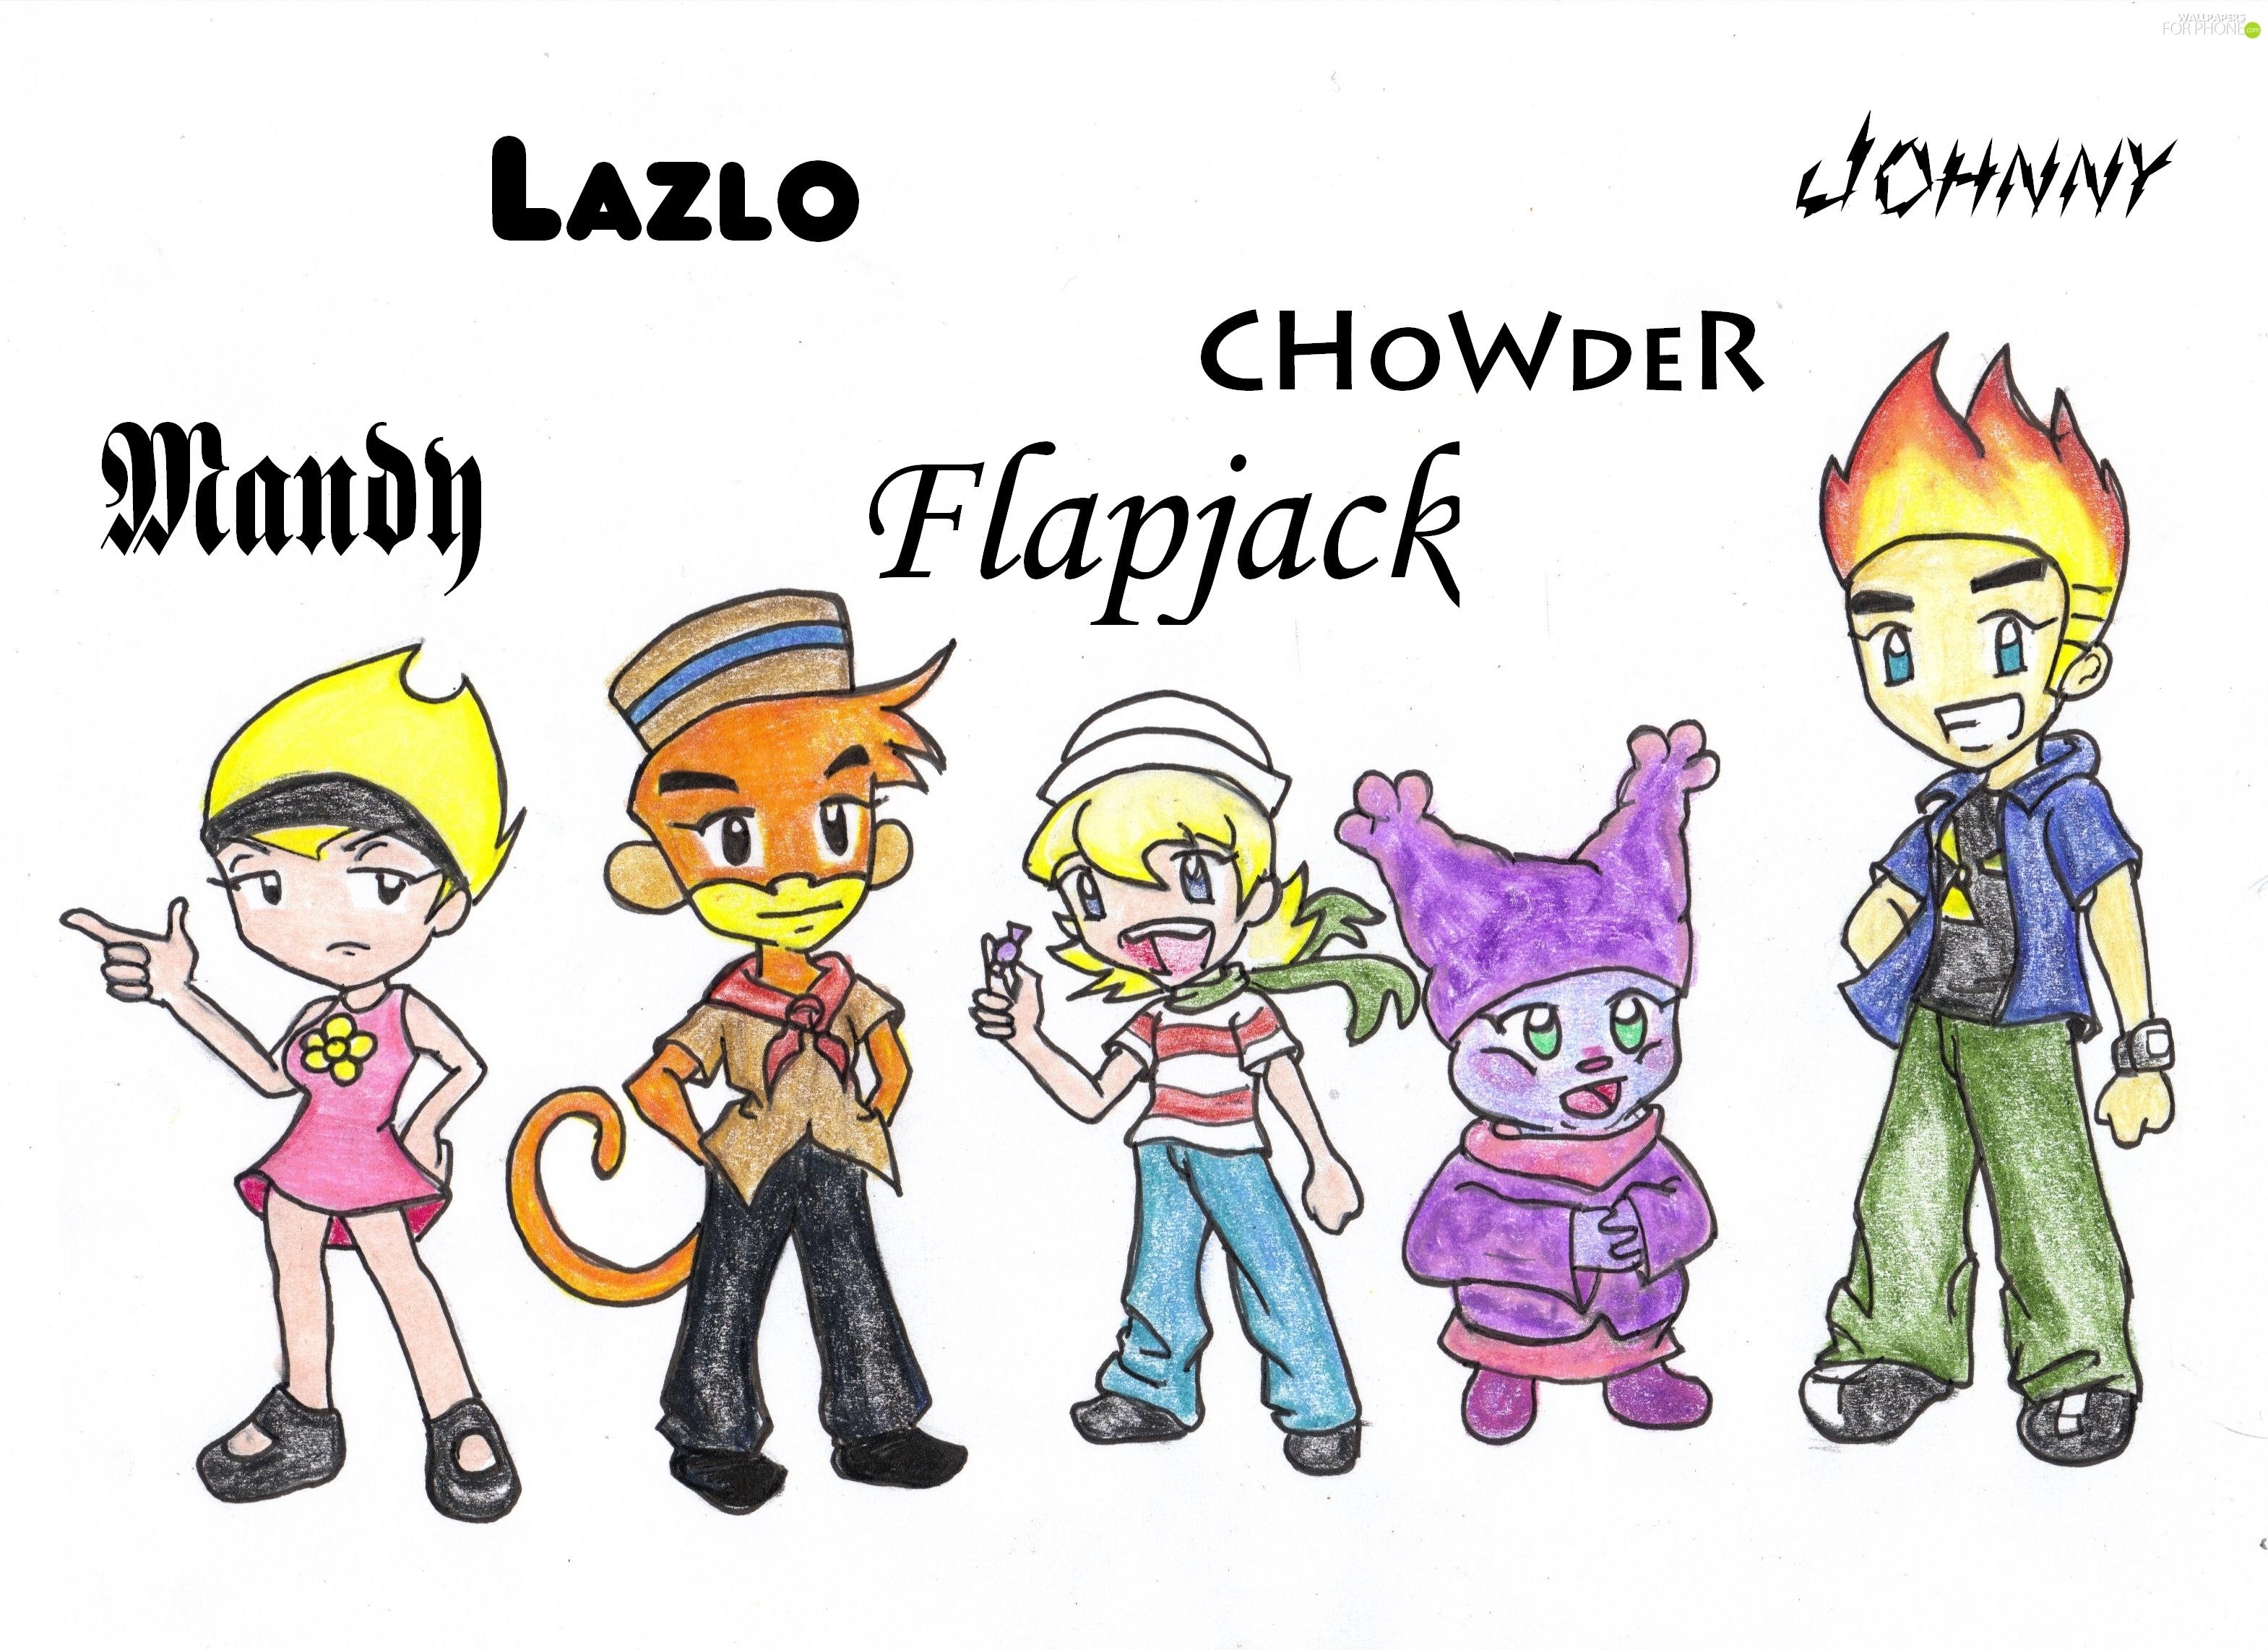 3139x2284 Drawing Of Cartoon Characters Of Cartoon Network Cartoon